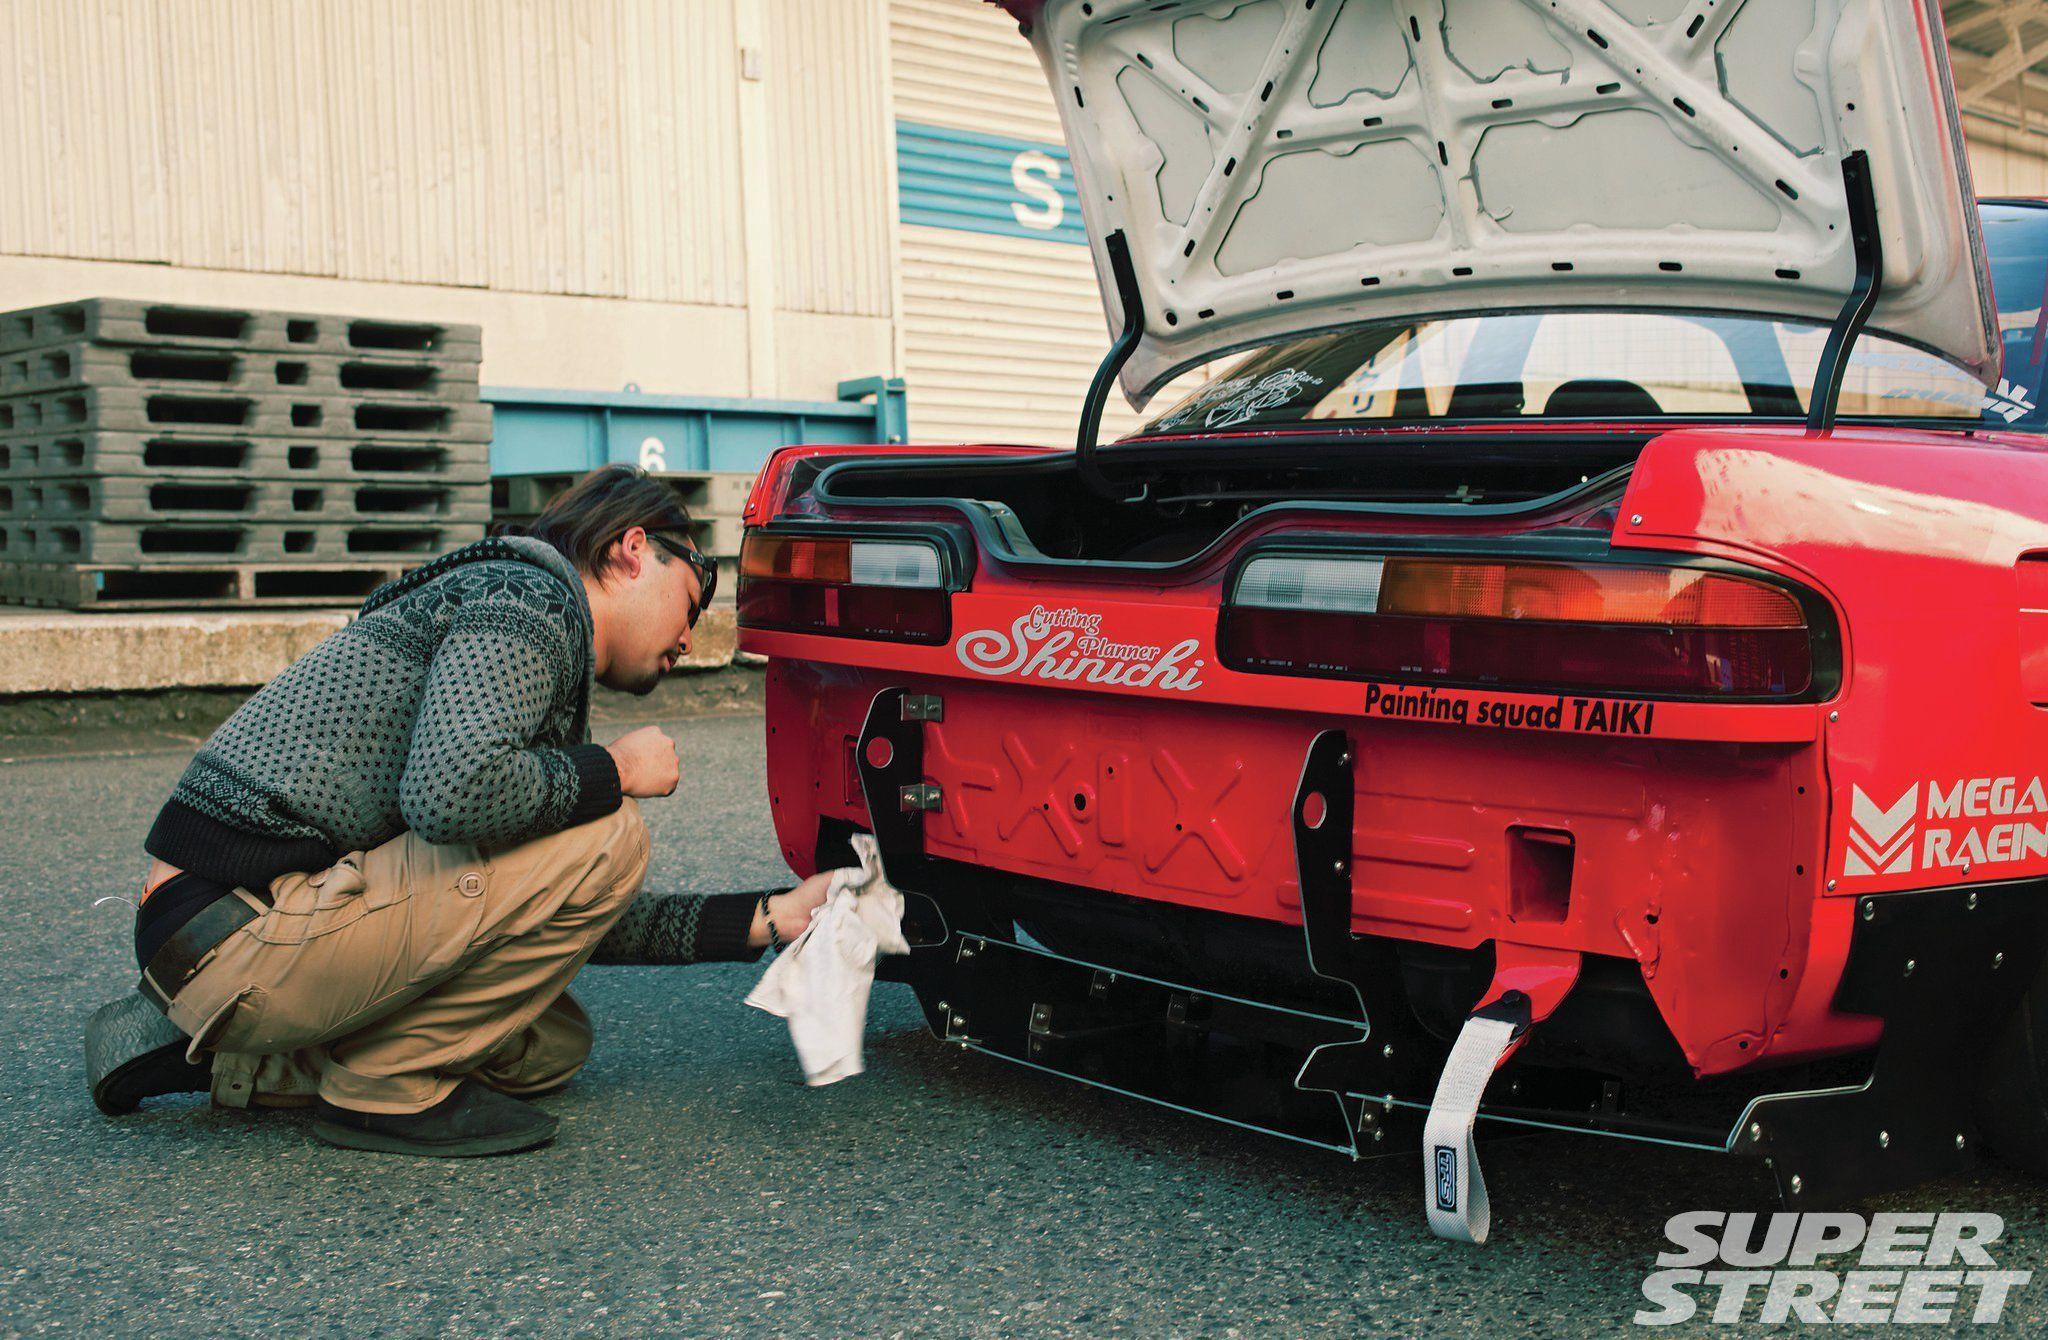 Http Image Superstreetonline Com F 71782440 W H Q80 Re0 Cr1 1990 Nissan Silvia S13 Rocket Bunny Rear Diffuser 04 Jdm Nissan Silvia Jdm Cars